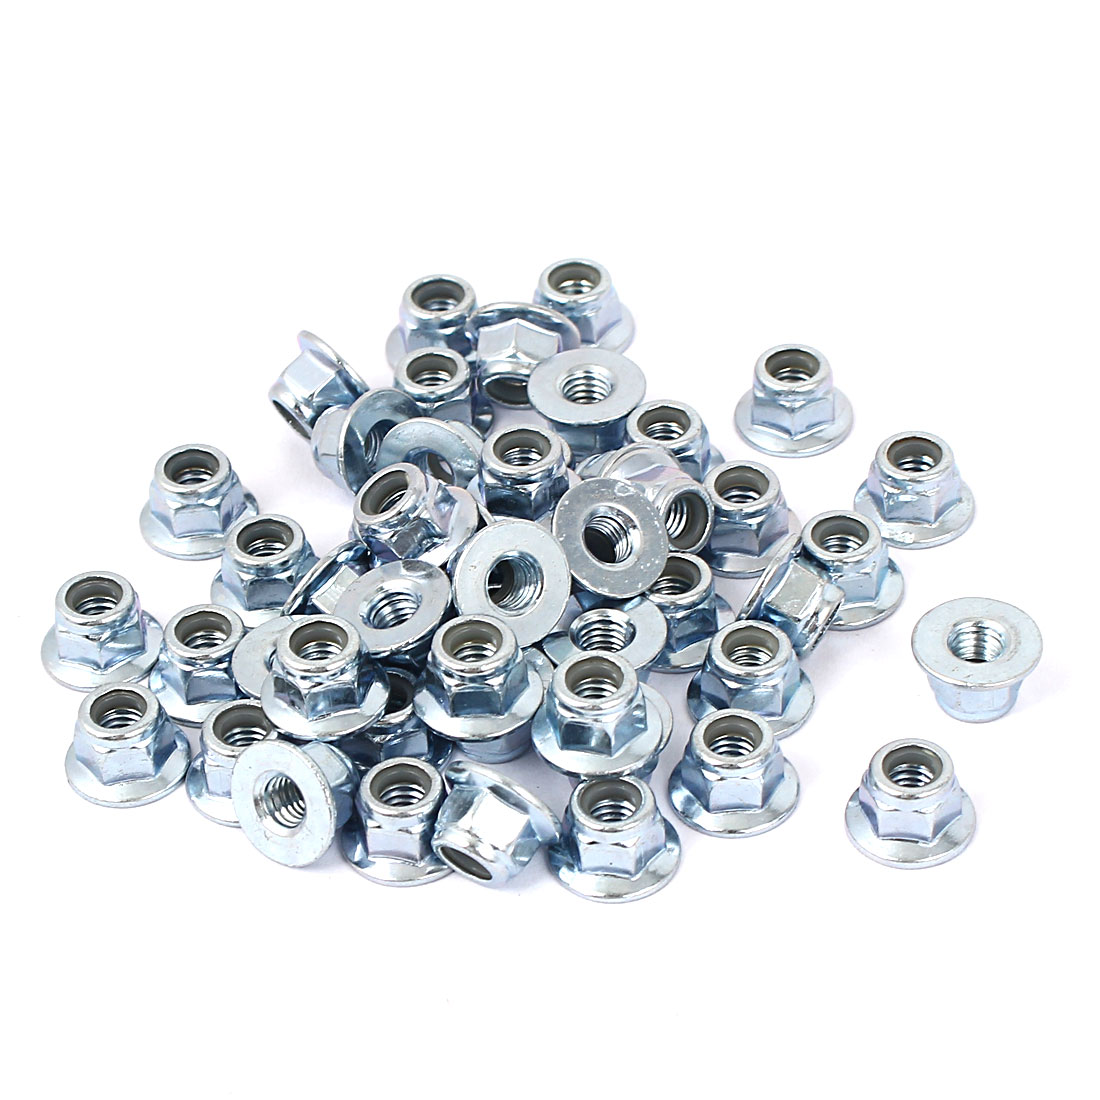 M5 Zinc Plated Hex Flange Nylon Insert Locking Lock Nuts 50pcs